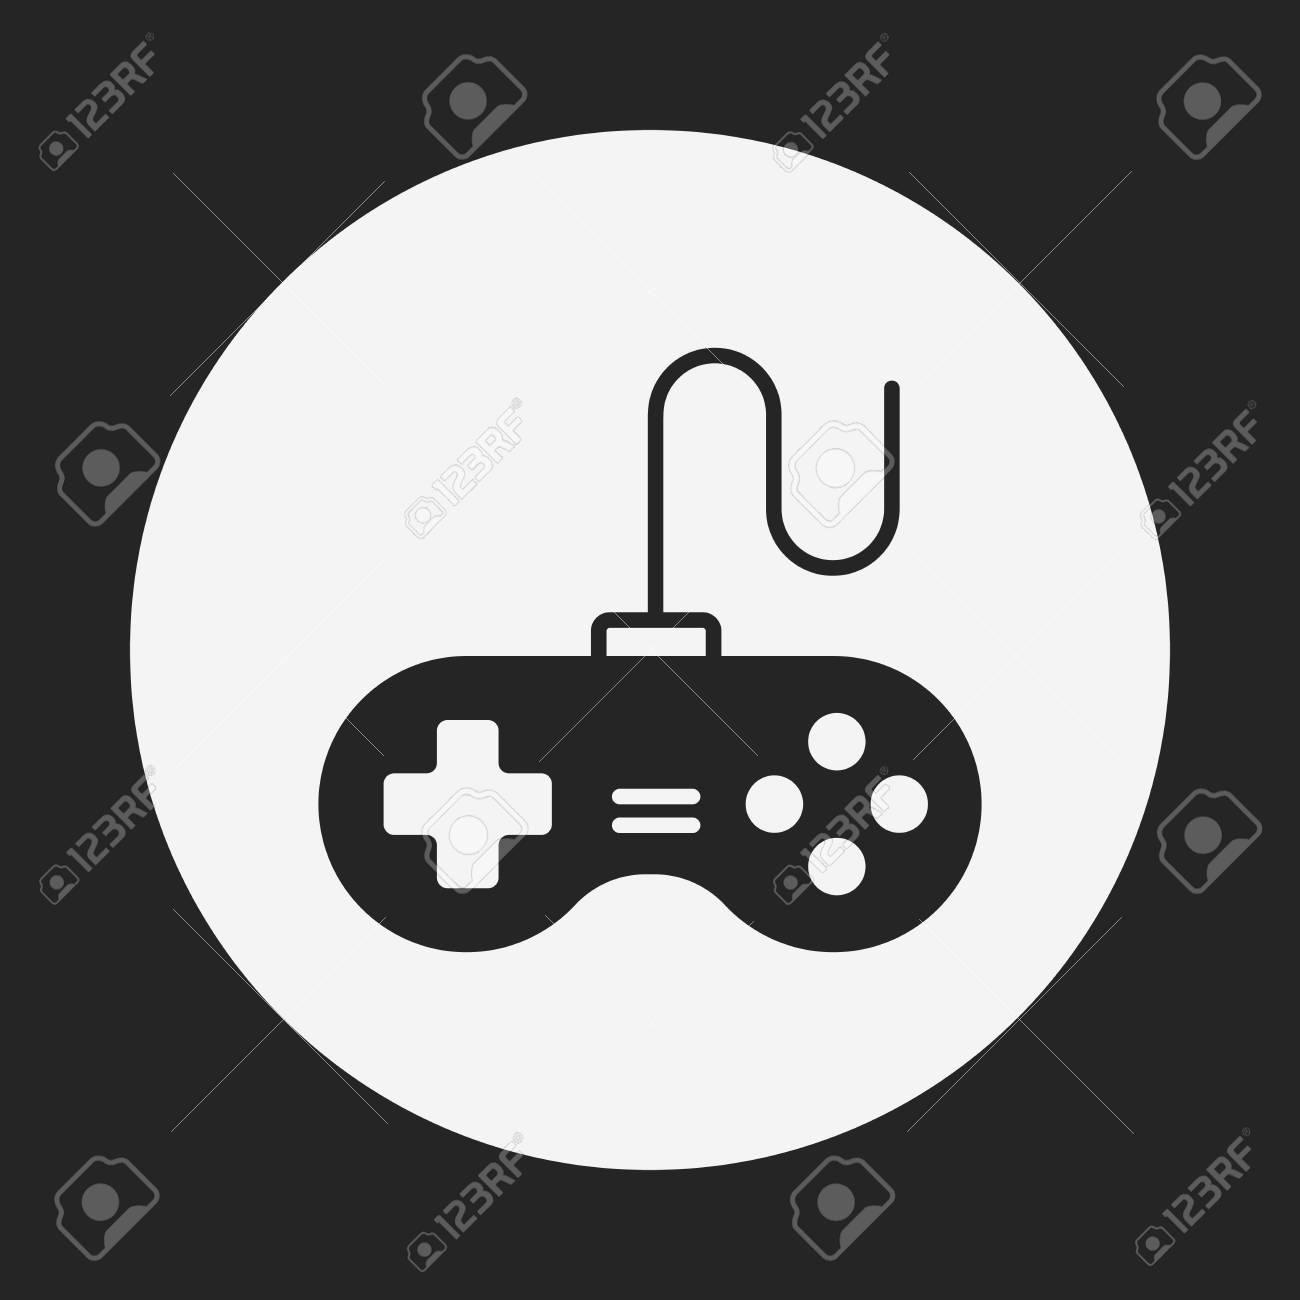 Game Controller Symbol Lizenzfrei Nutzbare Vektorgrafiken Clip Arts